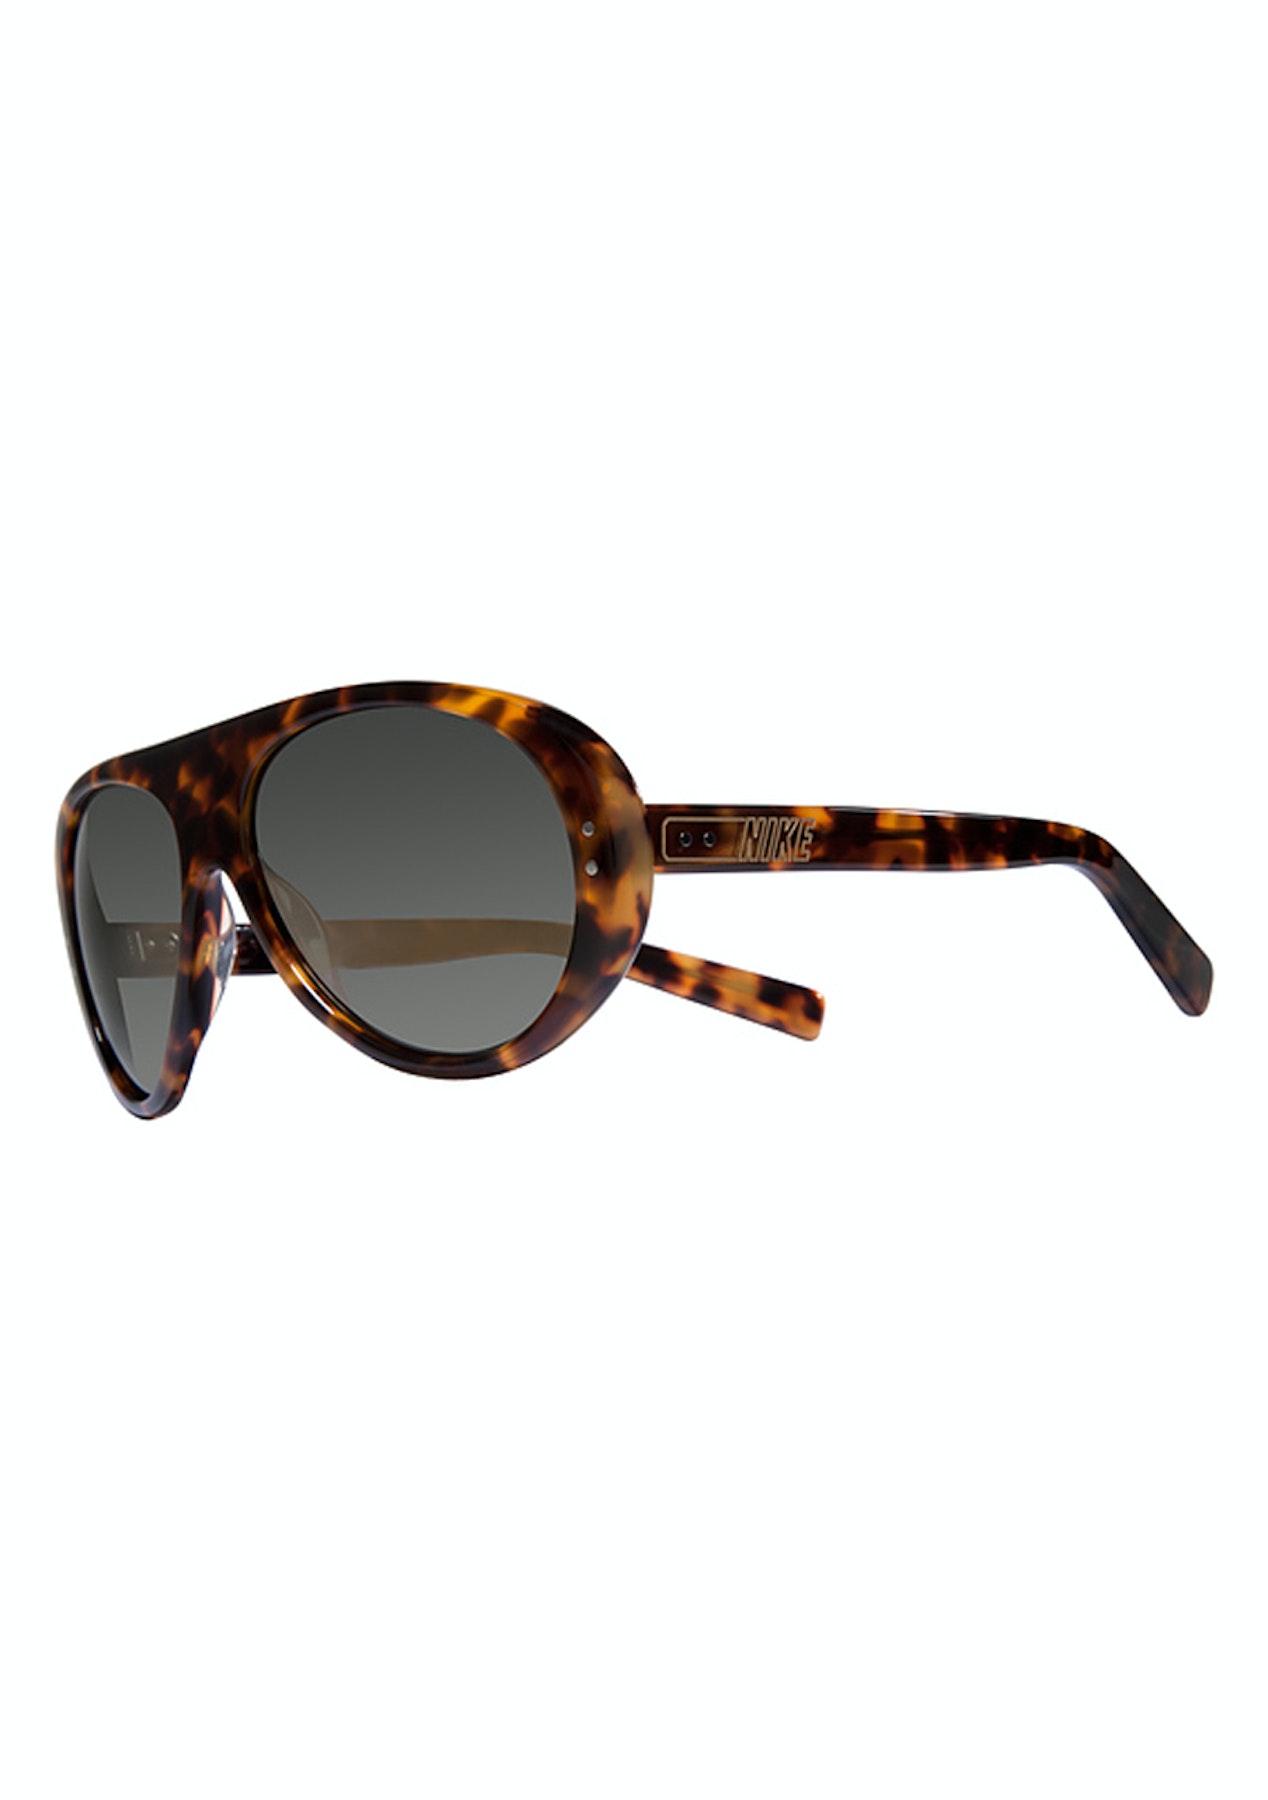 f2bd9f311e Nike Vintage 76 Sunglasses - Tortoise Frame  Green Lens - Sunglasses Super  Sale From  9.95 - Onceit